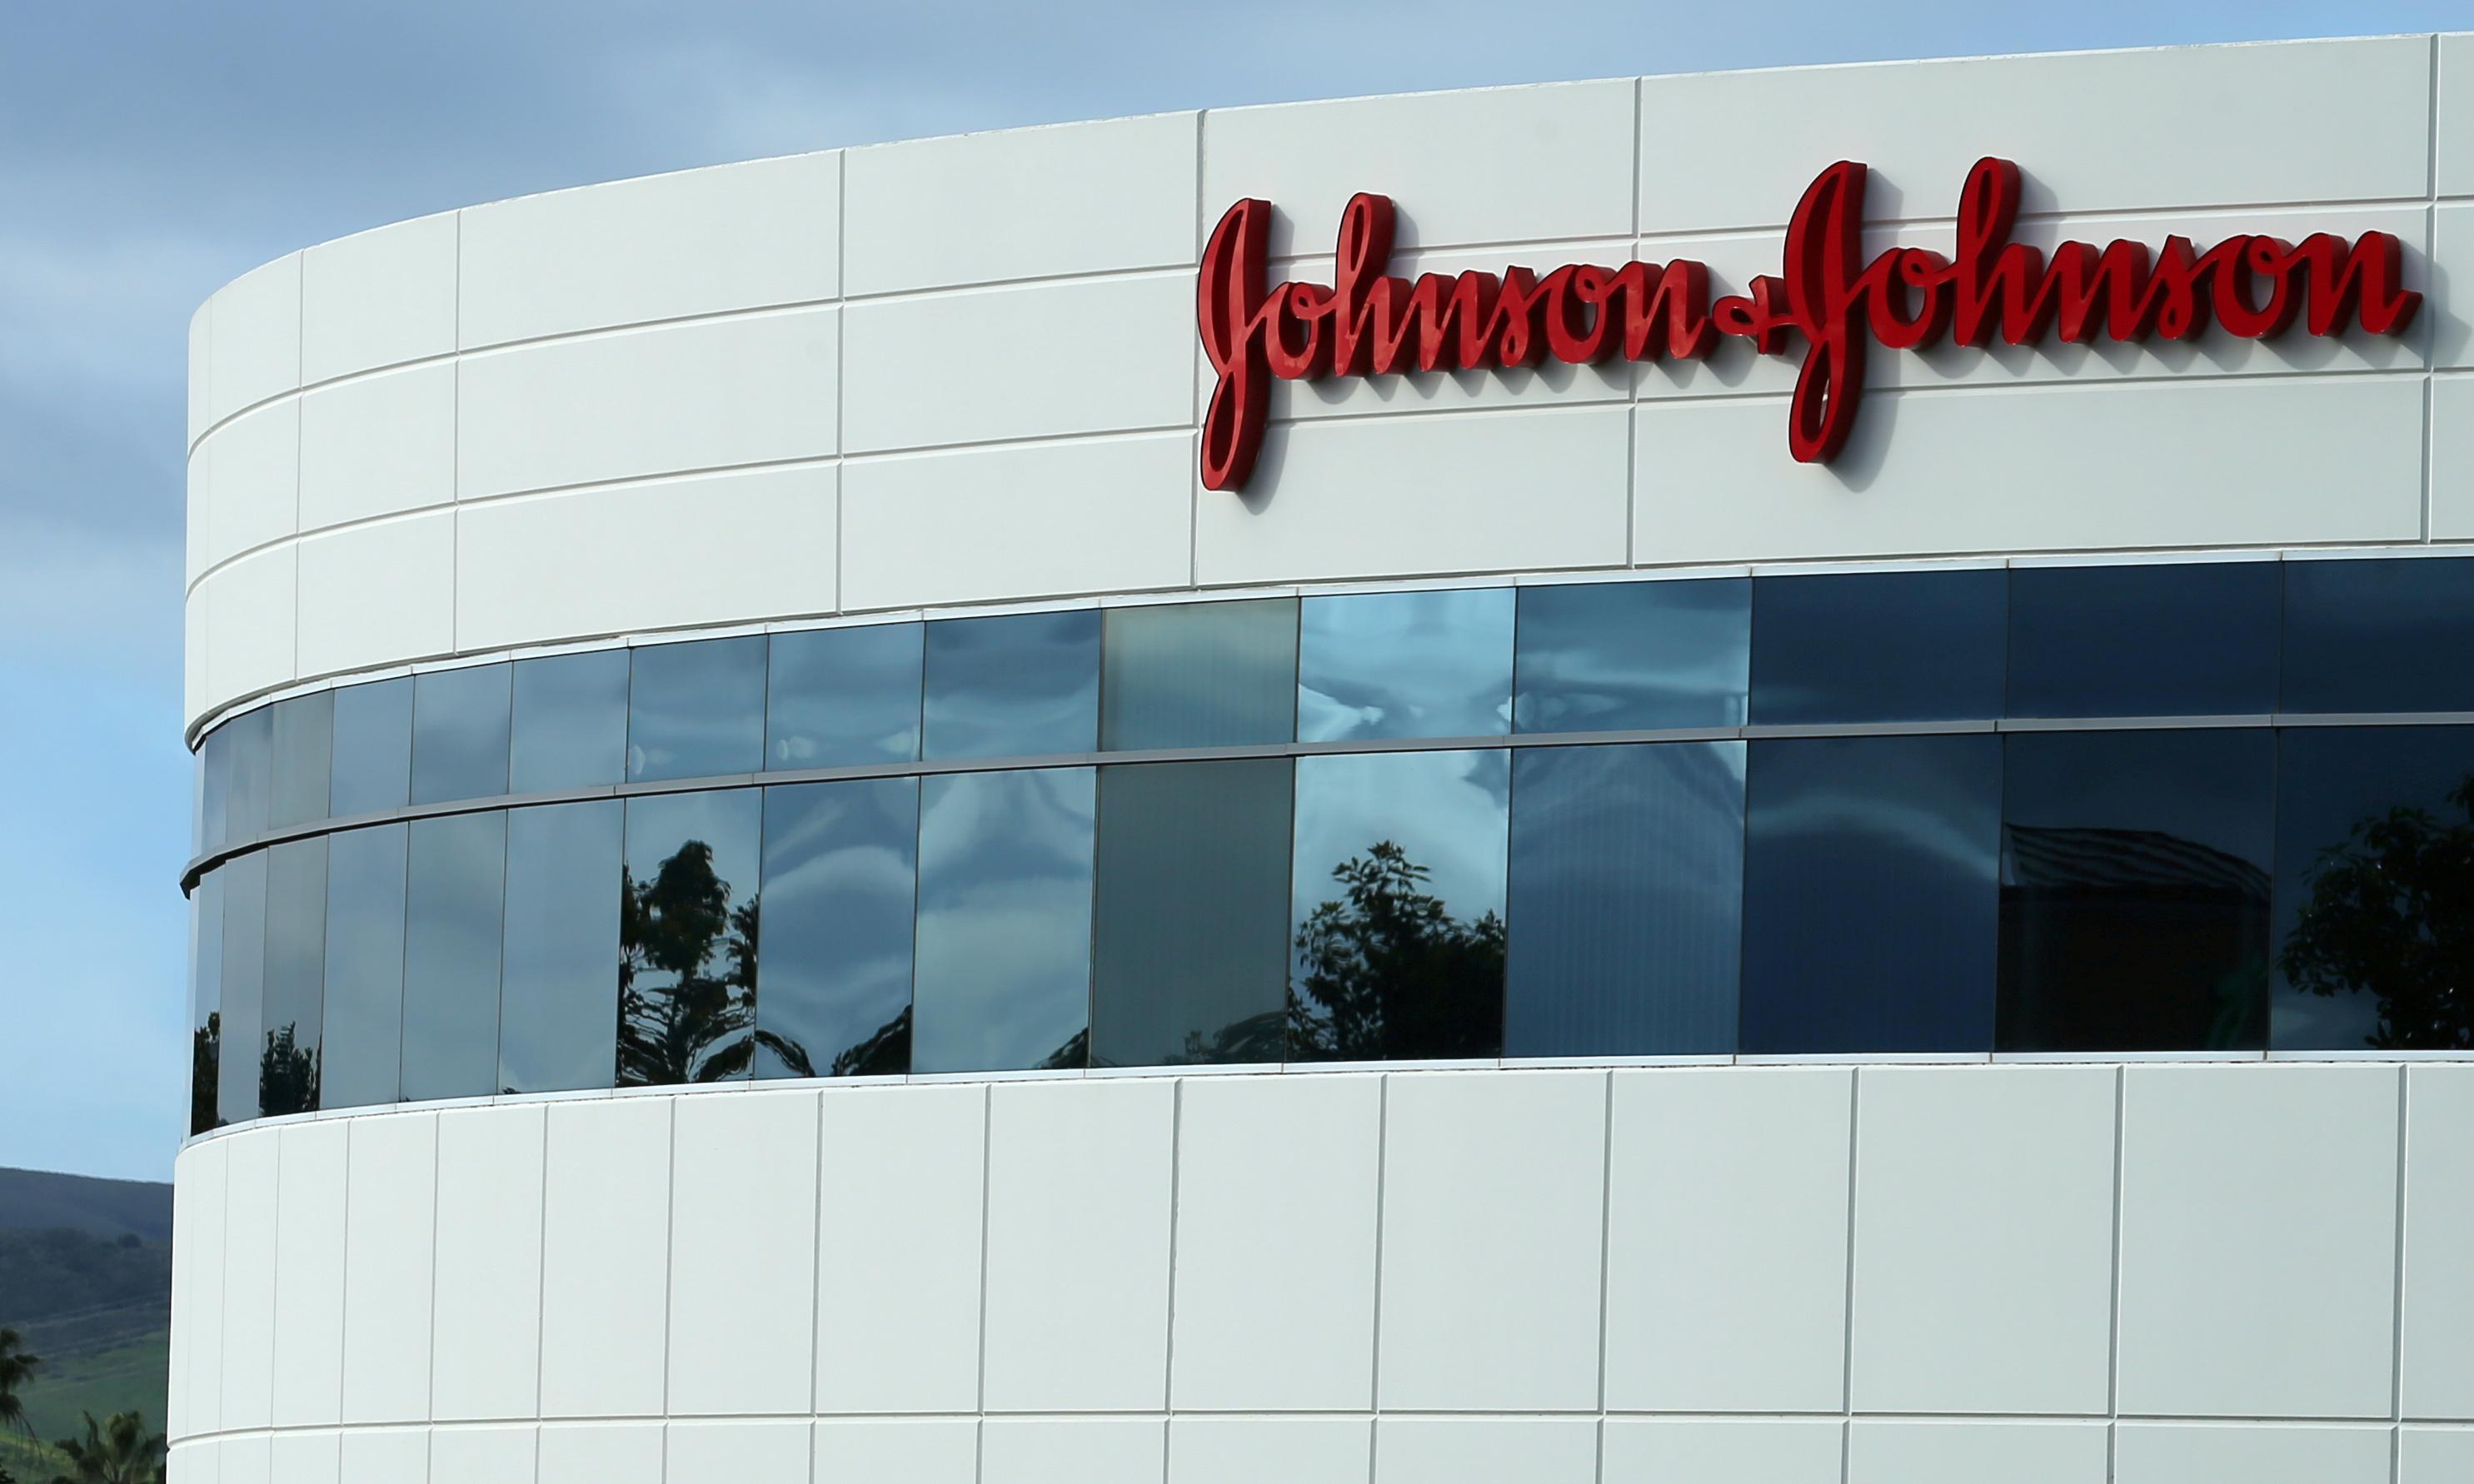 Johnson & Johnson faces multibillion opioids lawsuit that could upend big pharma